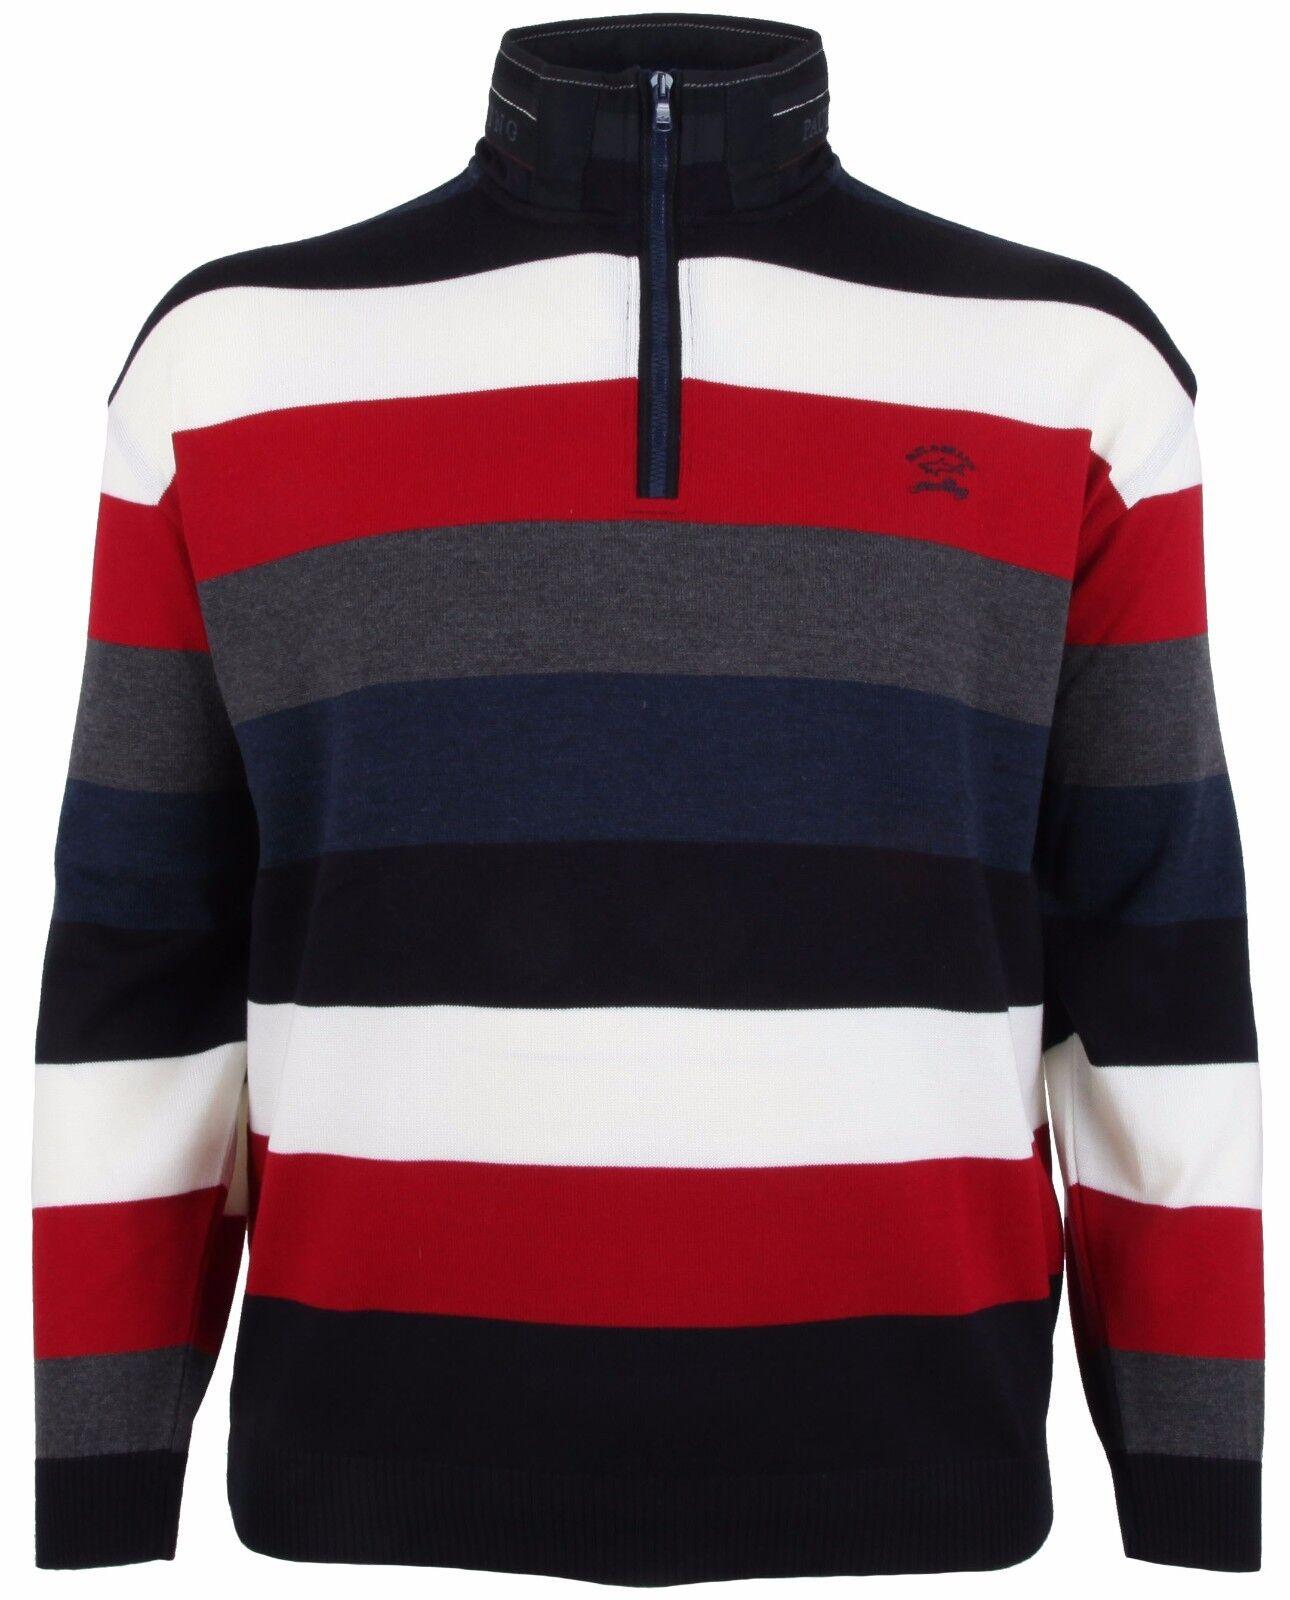 PAUL & SHARK YACHTING Pullover Sweater Troyer Größe 4XL XXXXL COOL TOUCH NEU NEW